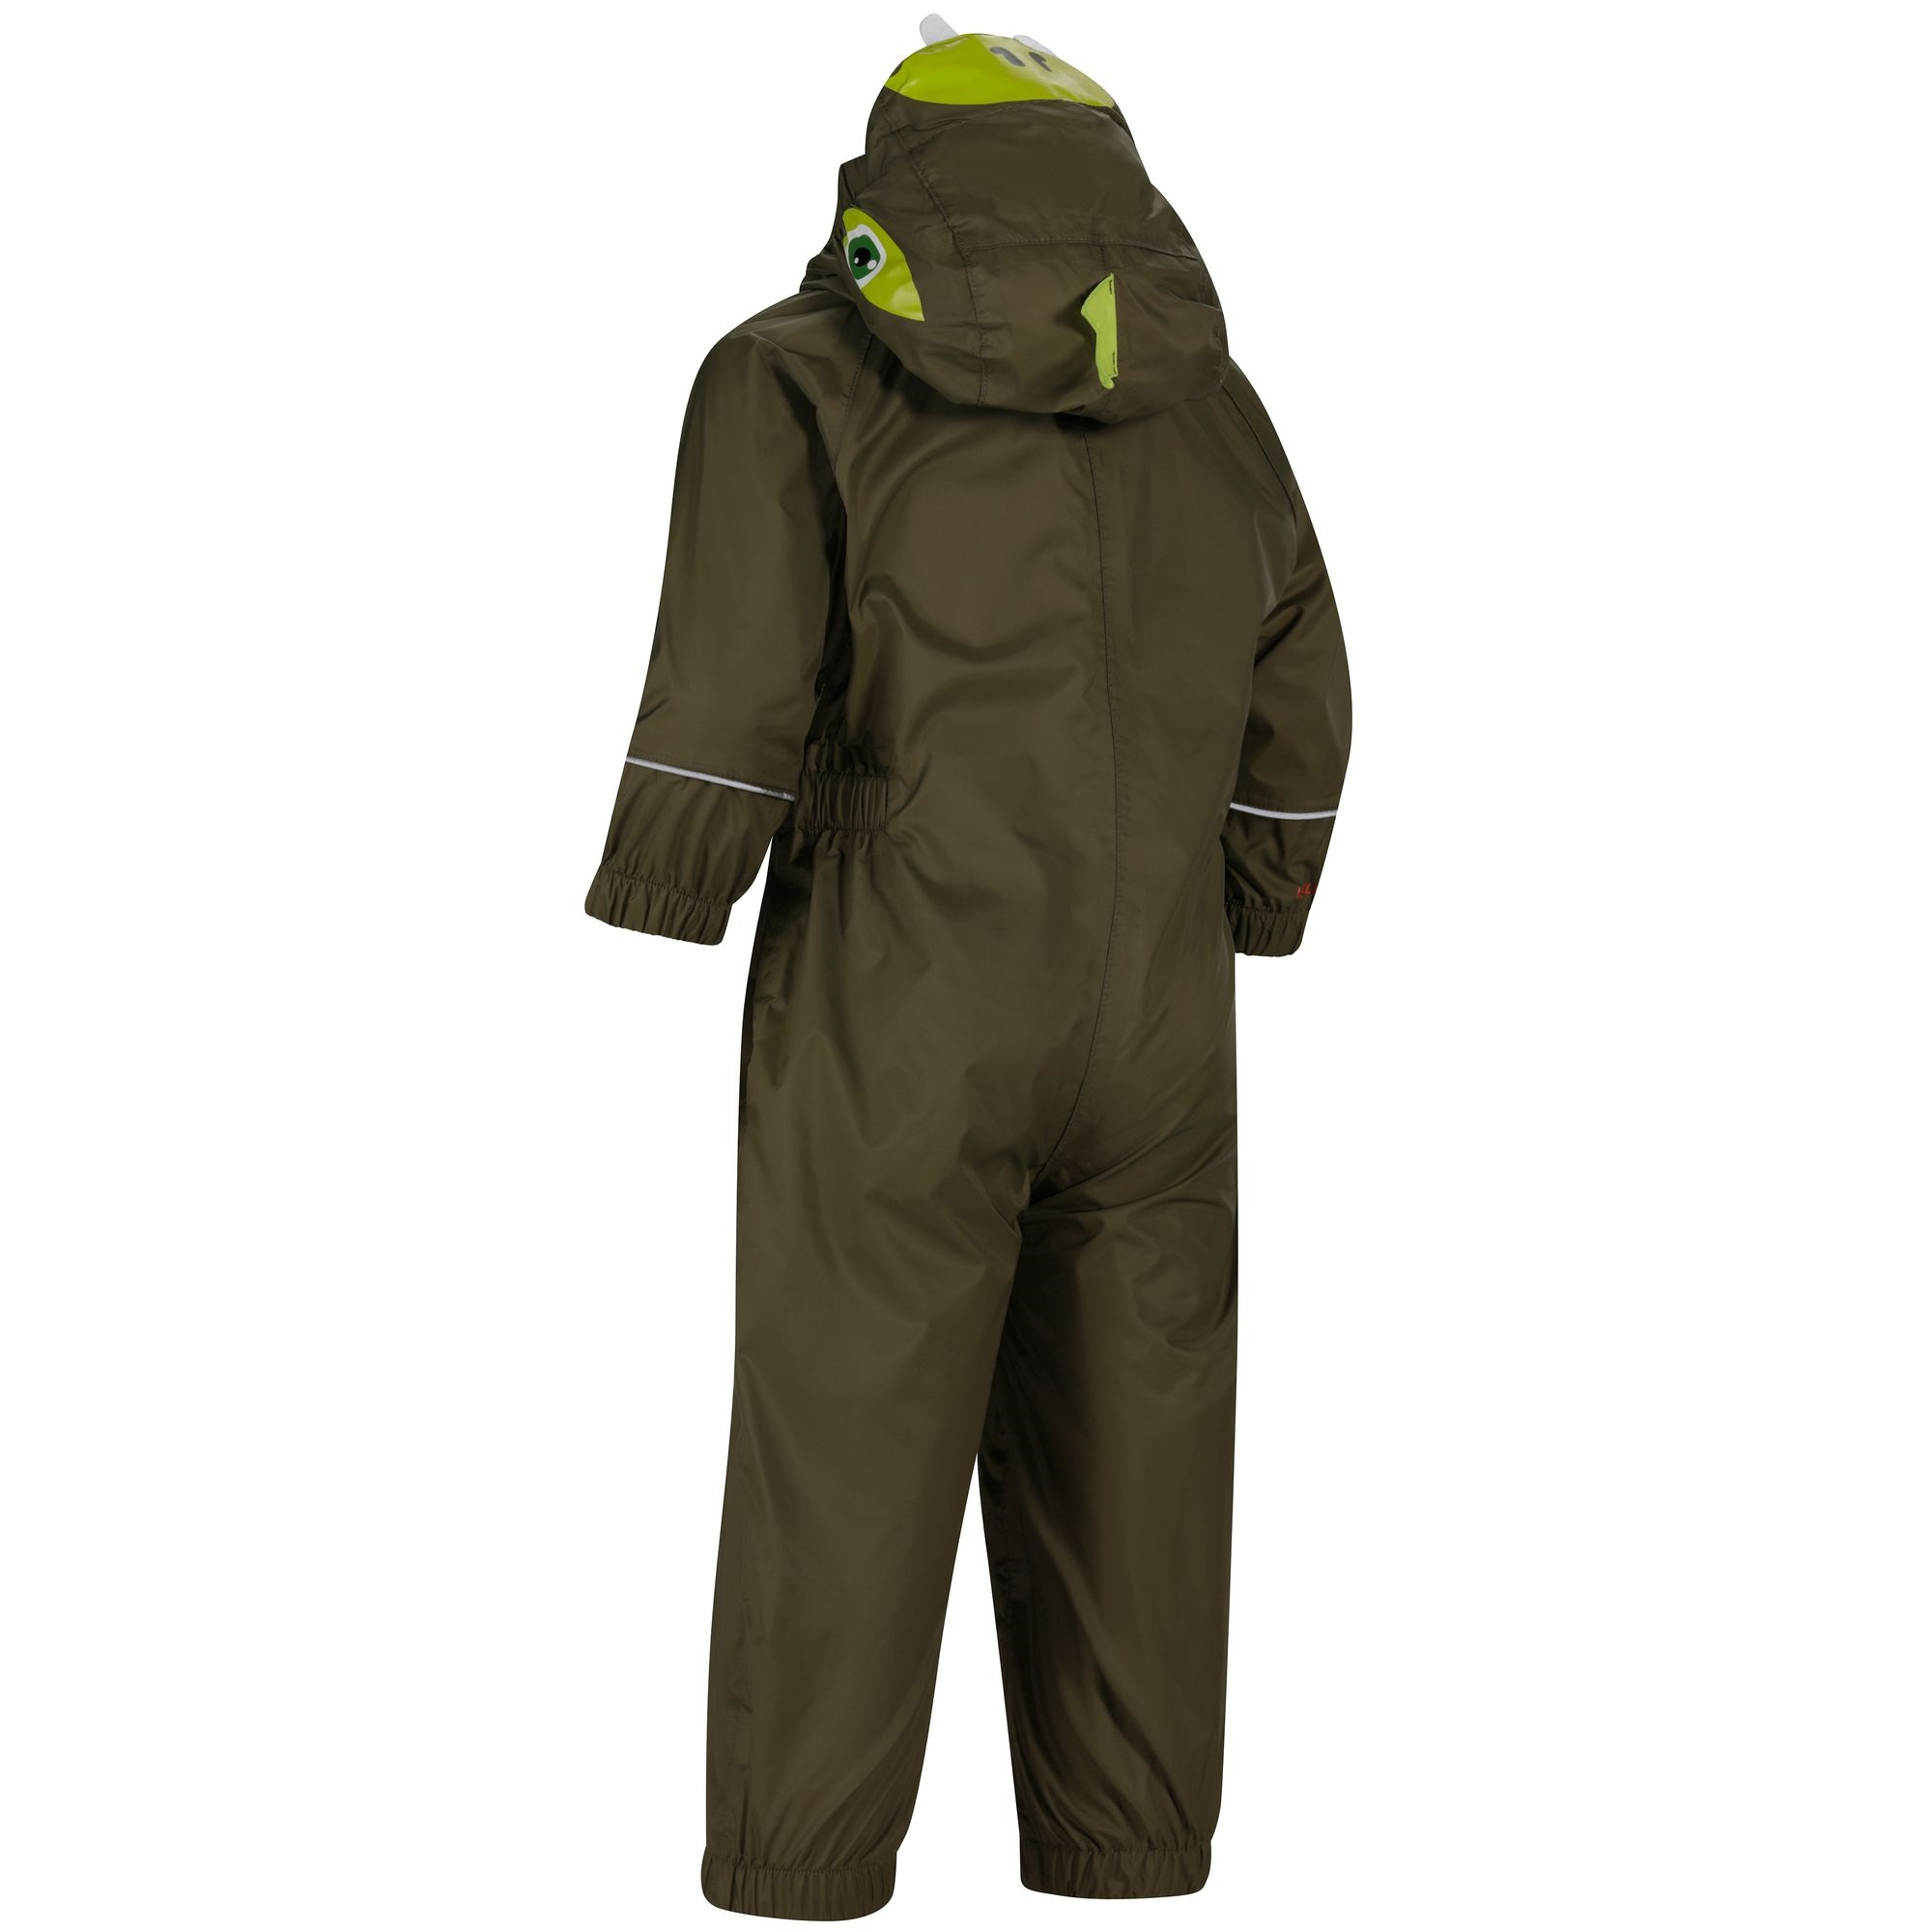 Regatta Great Outdoors Kids Charco Waterproof Rain Suit RG700